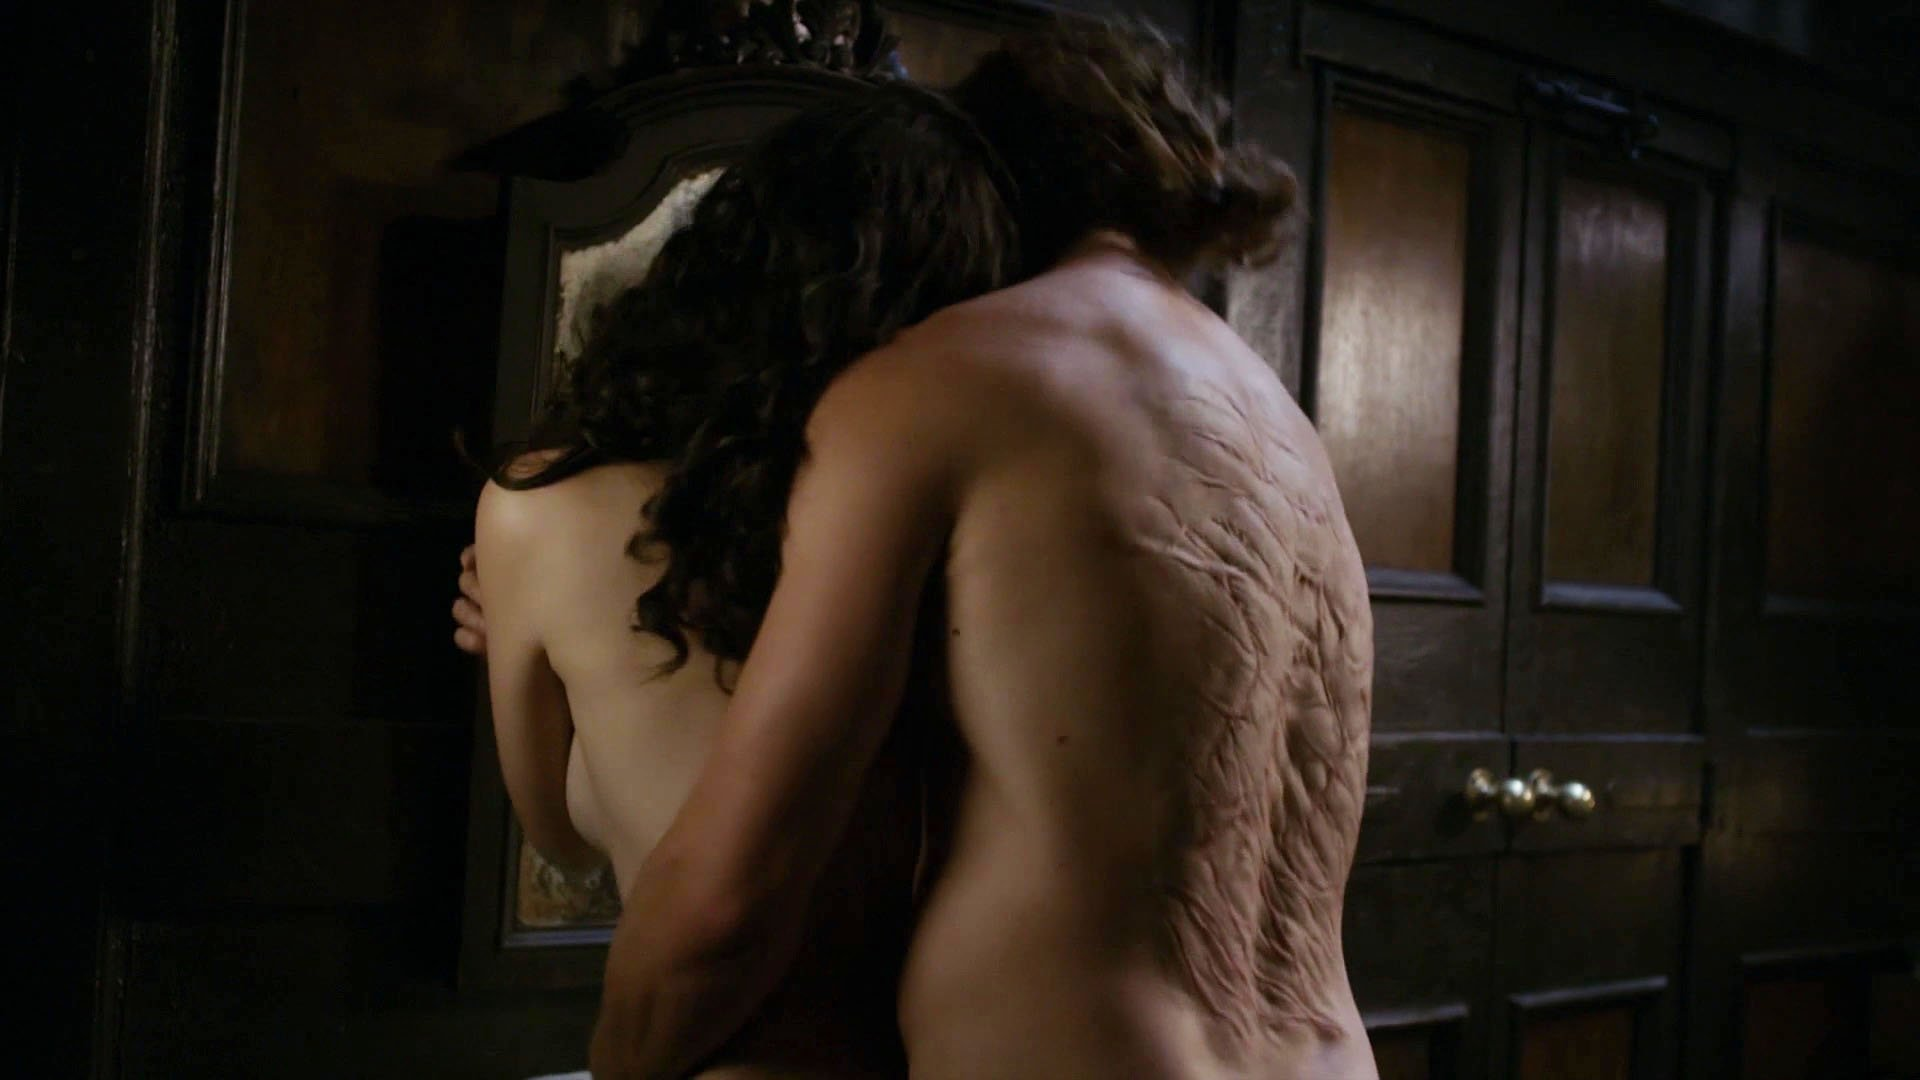 Caitriona Balfe nude - Outlander s03e11 (2017)